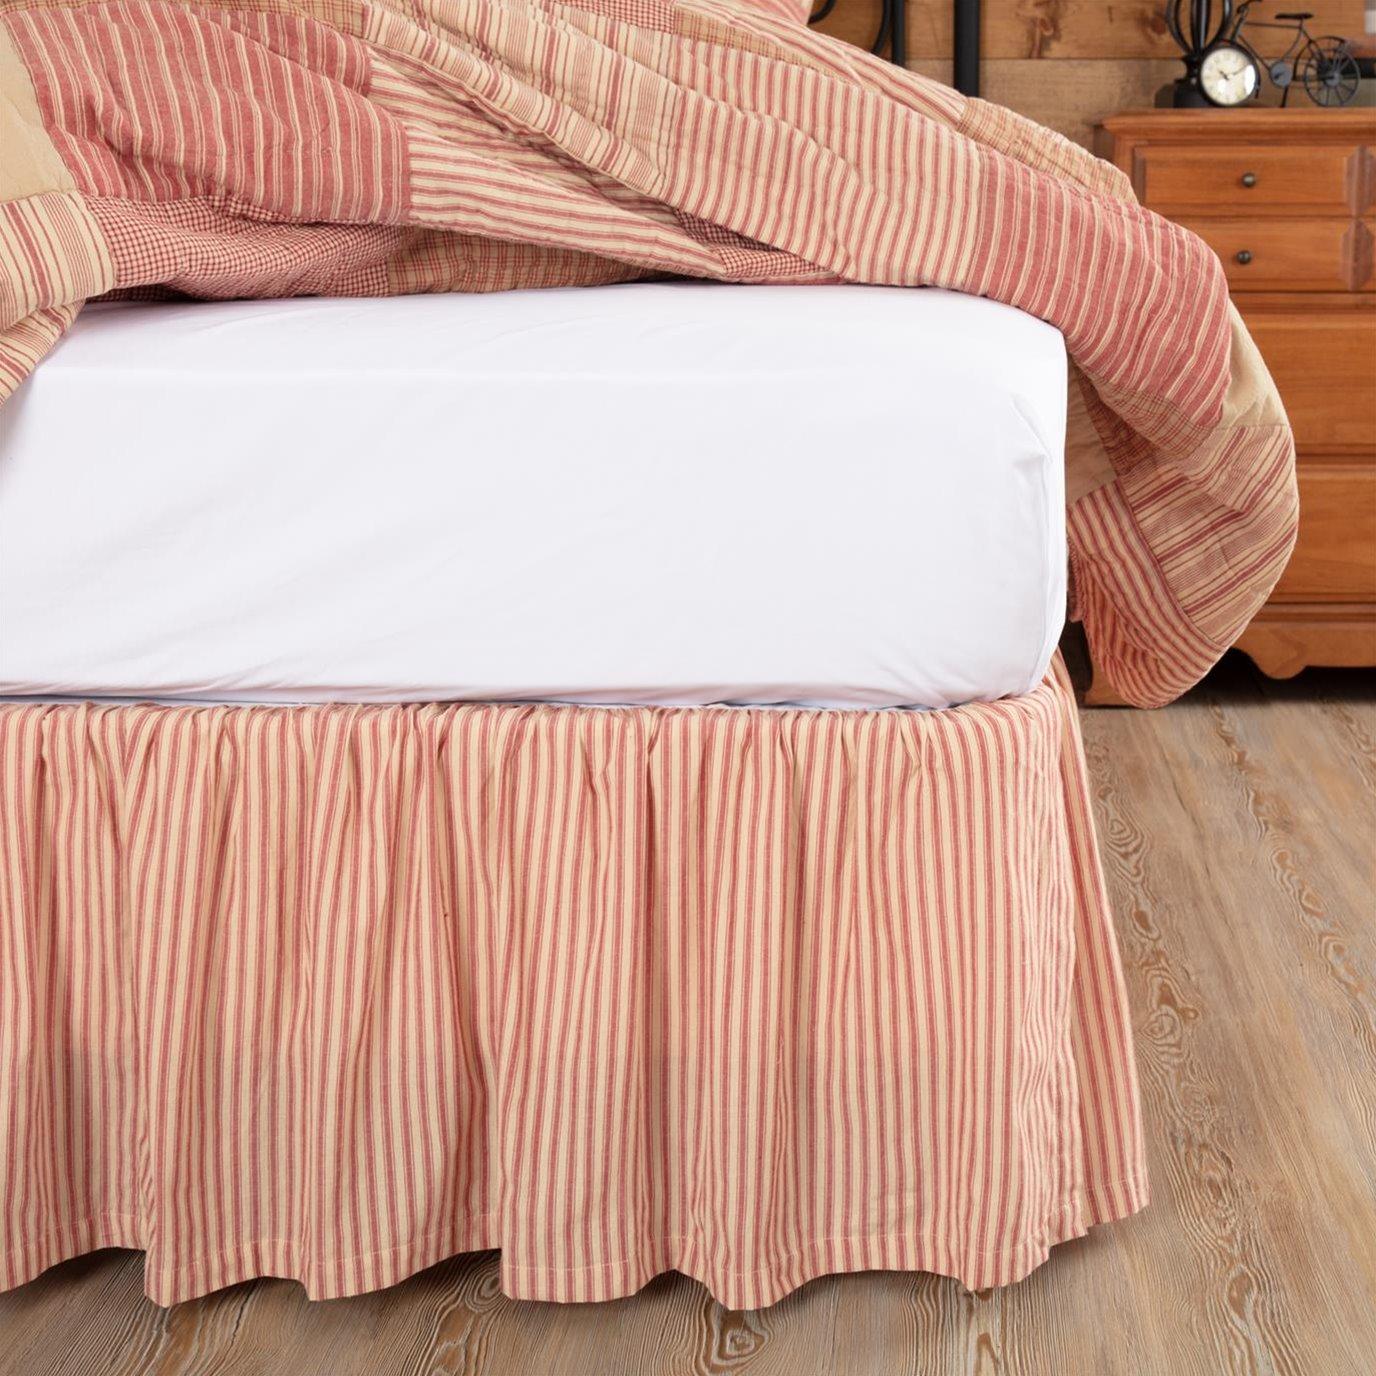 Sawyer Mill Red Ticking Stripe Queen Bed Skirt 60x80x16